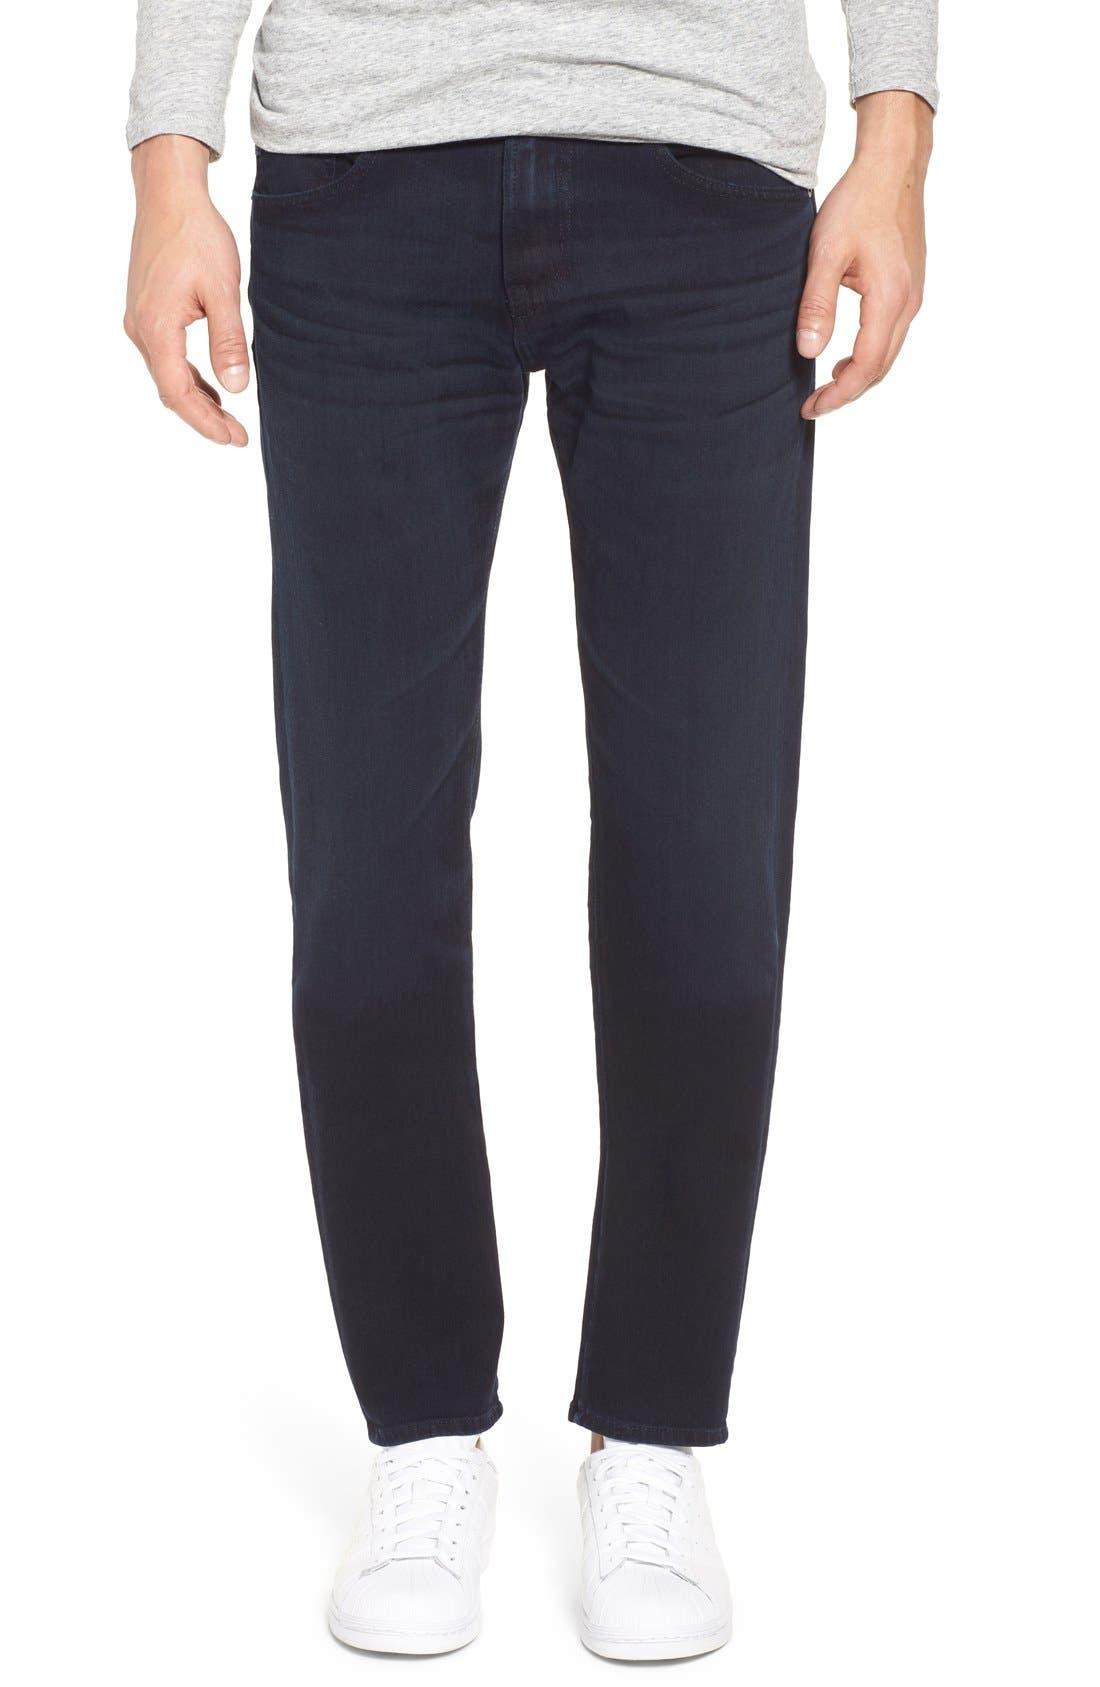 AG 'Dylan' Skinny Fit Jeans